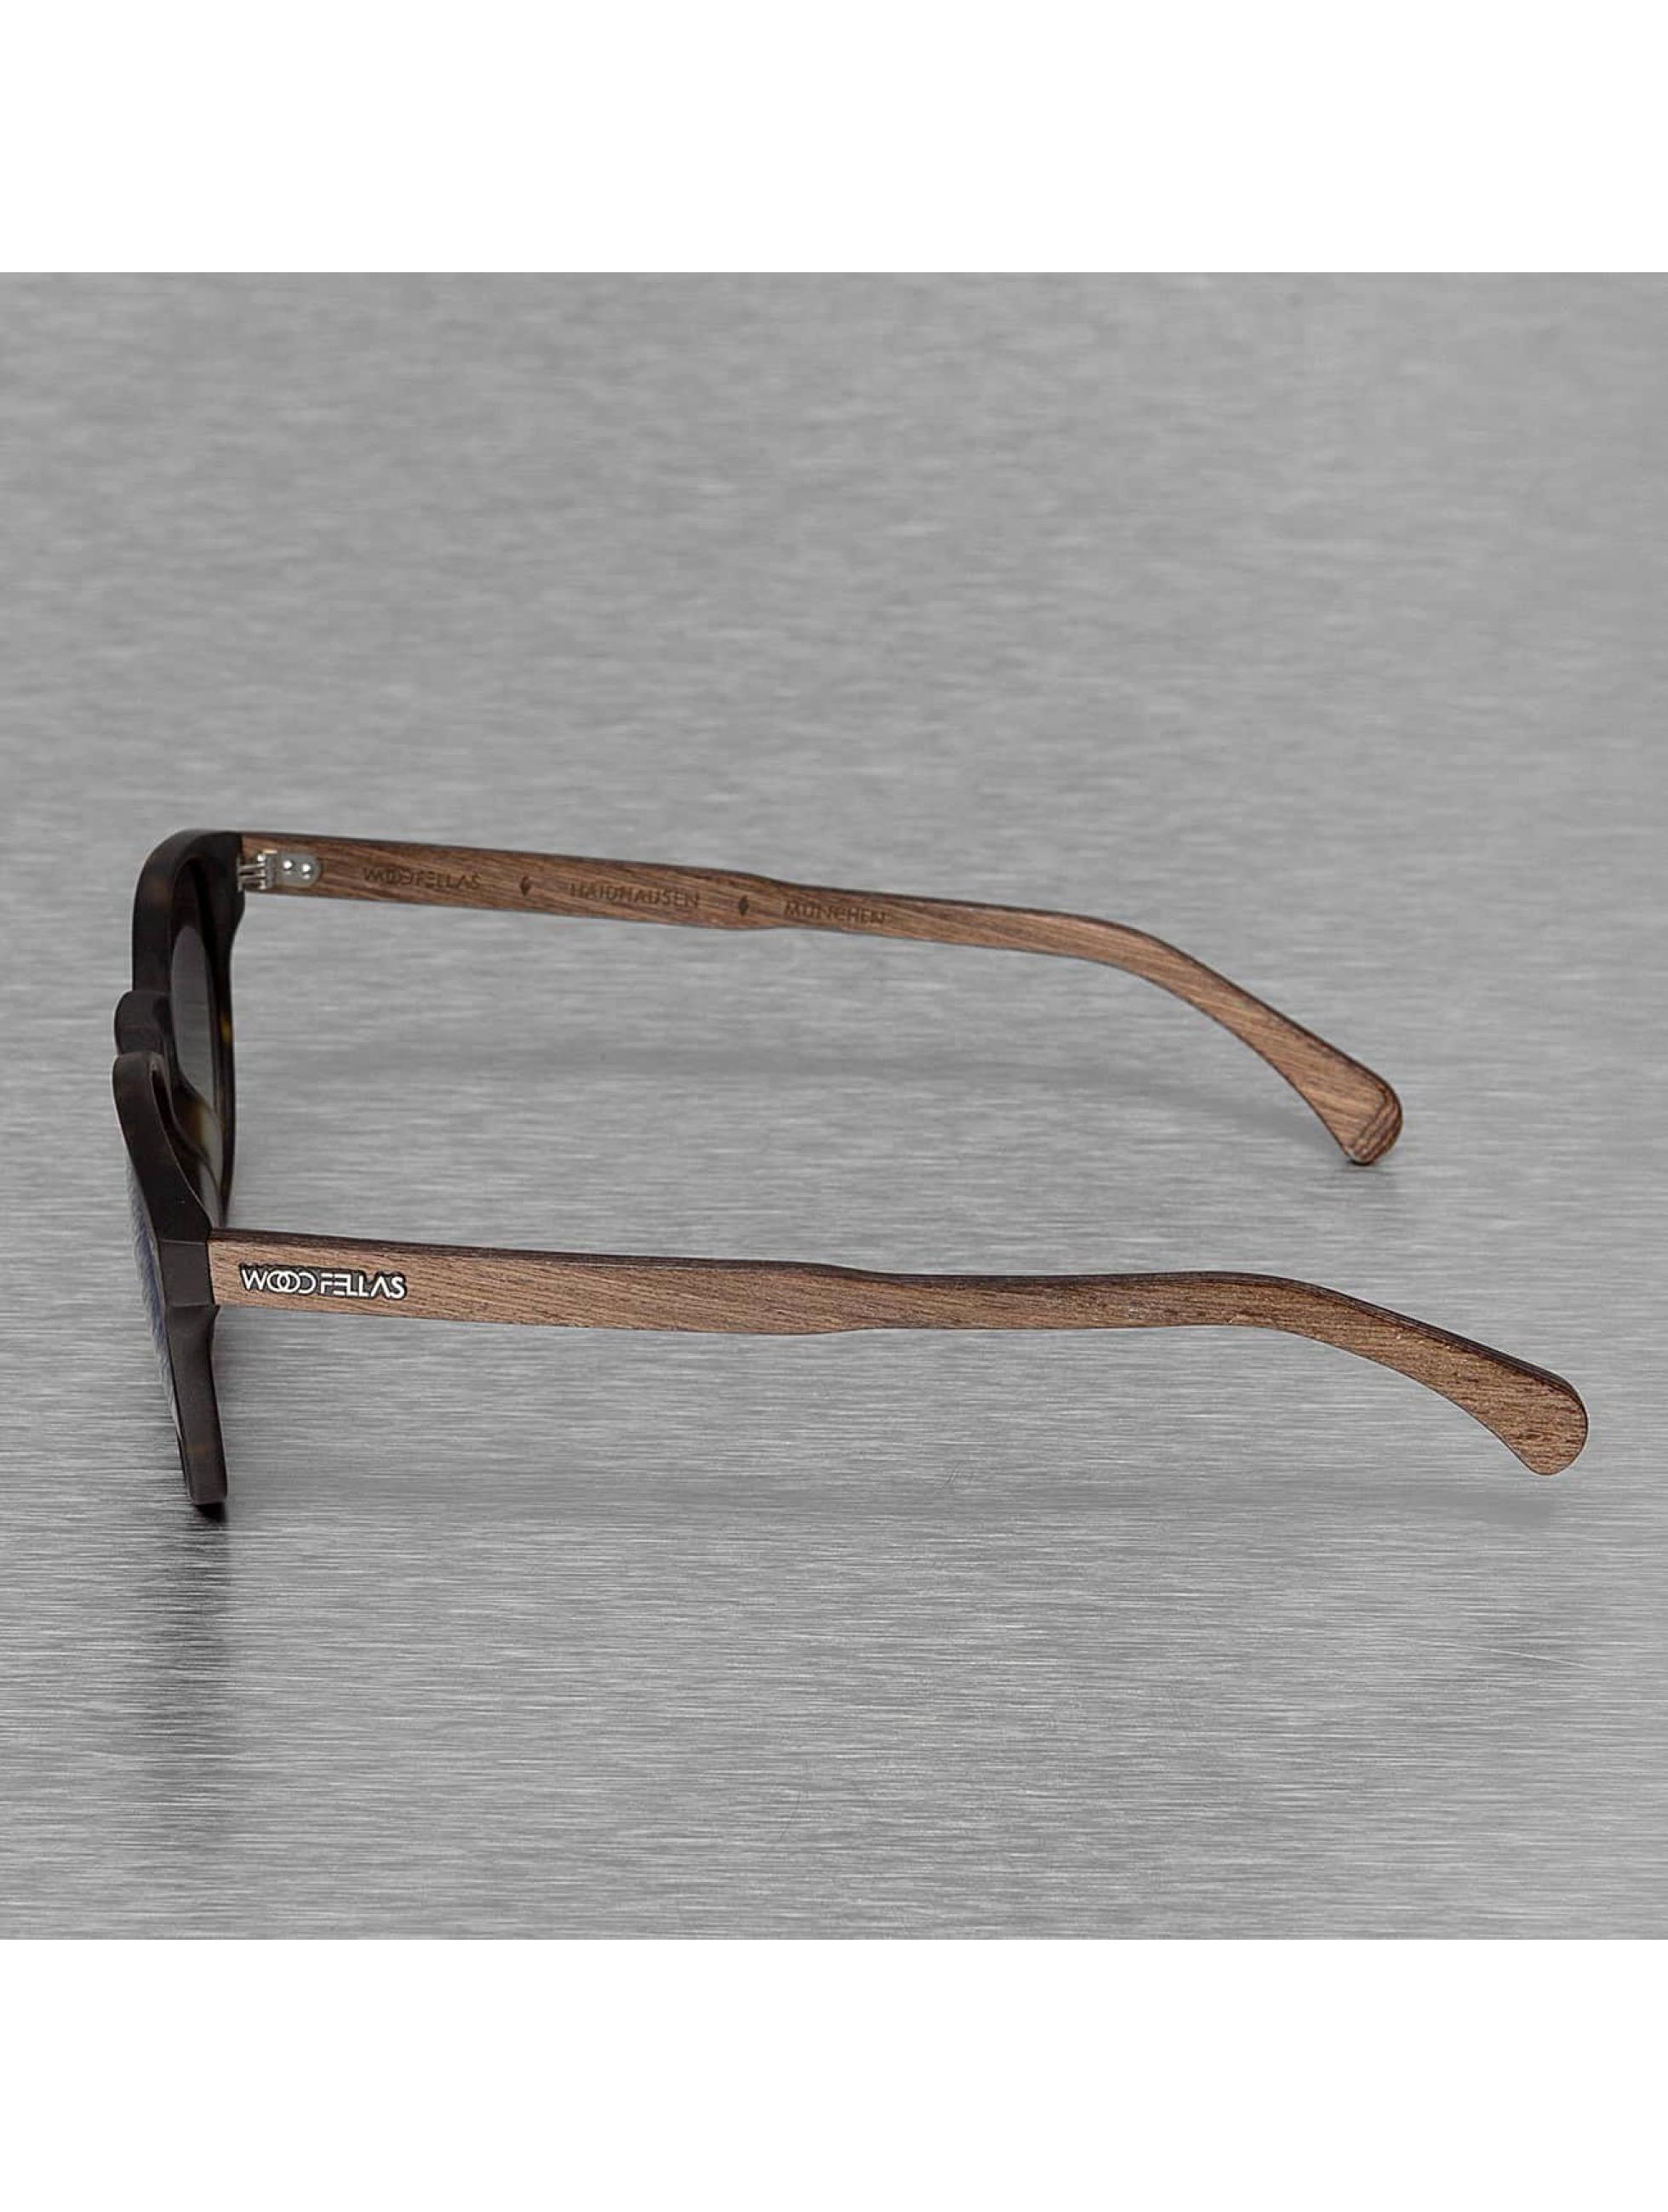 Wood Fellas Eyewear Sonnenbrille Eyewear Haidhausen Polarized Mirror braun